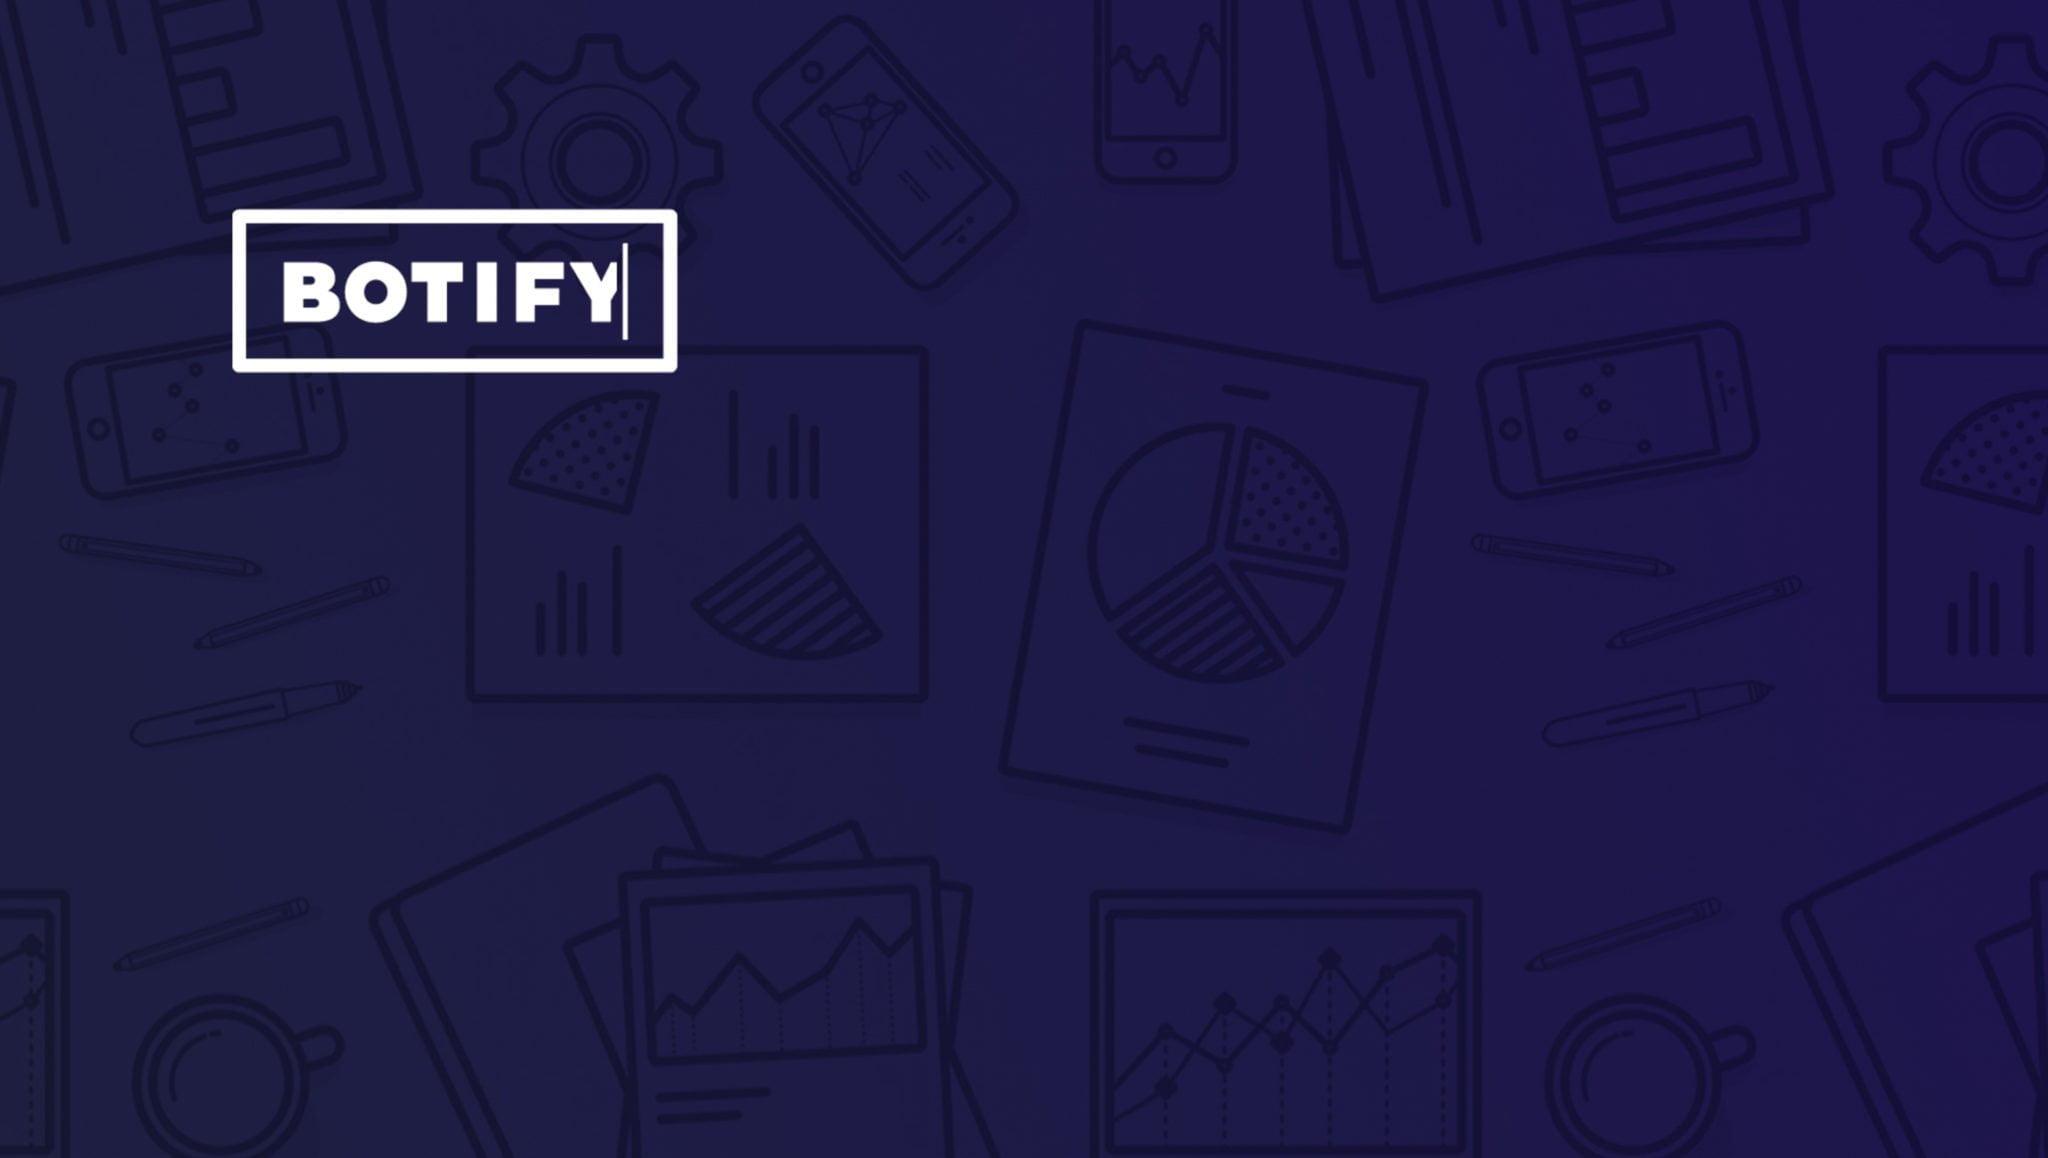 Botify Becomes Full-Service SEO Platform with Latest Innovation, Botify Keywords – MarTech Series